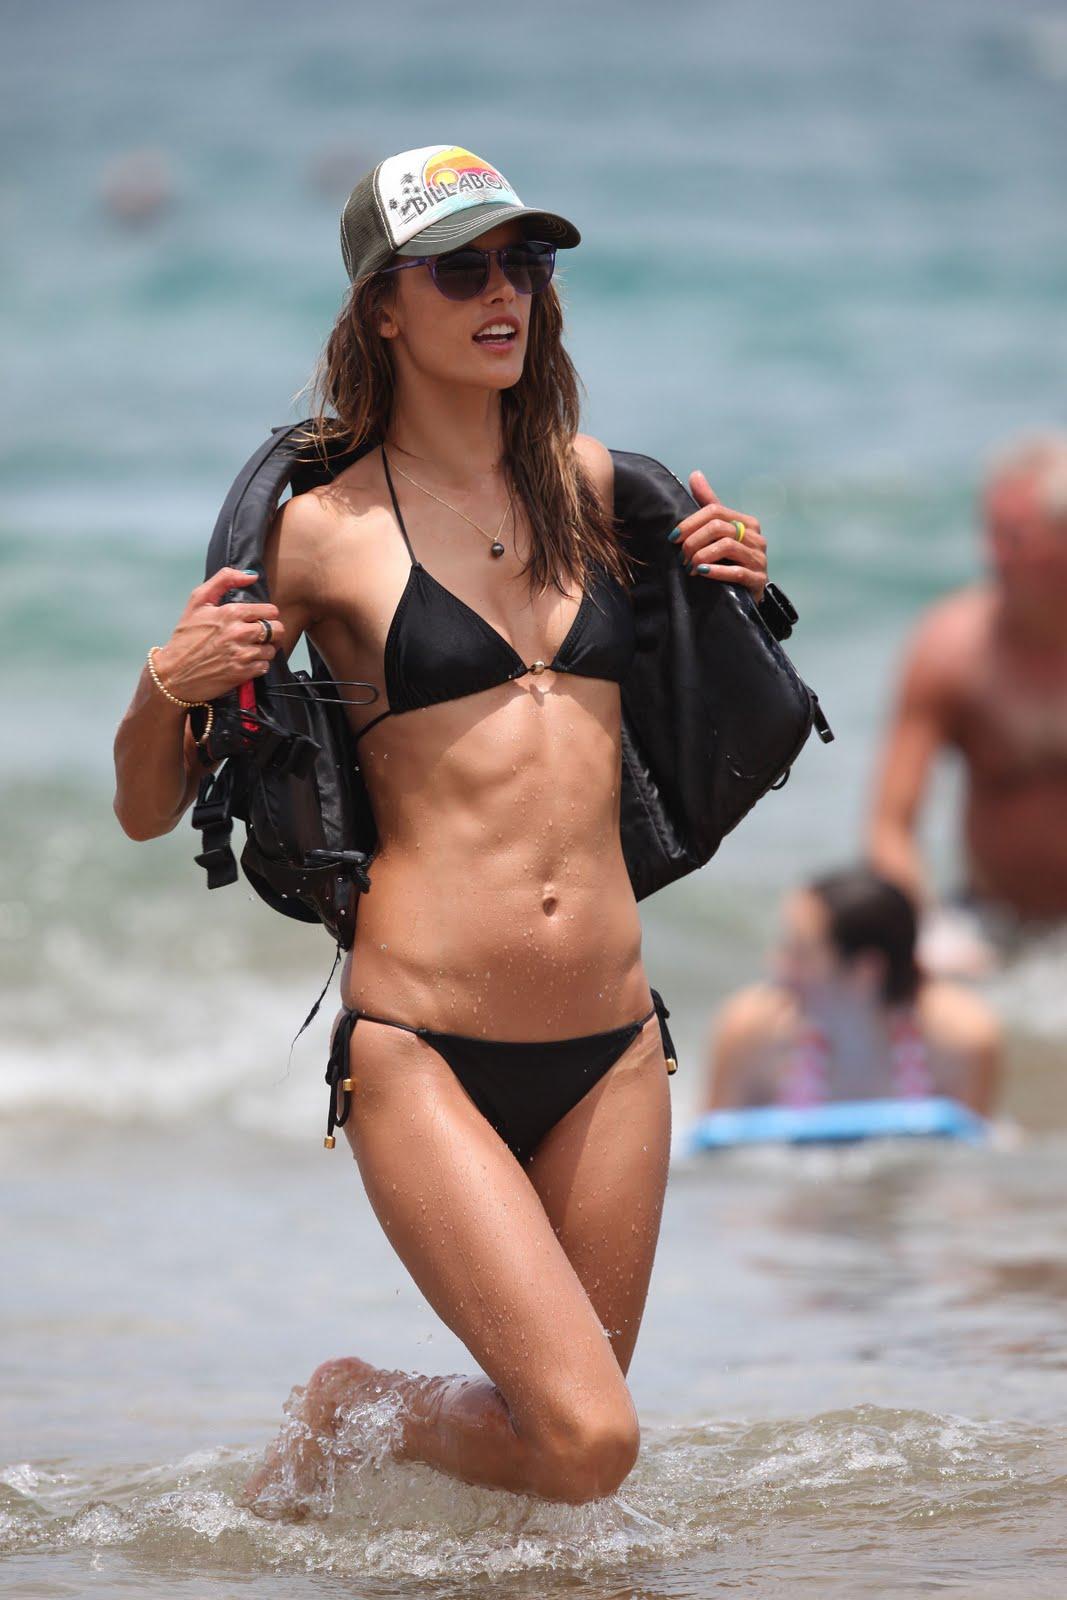 Bikini Noomi Rapace nude (59 foto and video), Tits, Is a cute, Feet, bra 2017